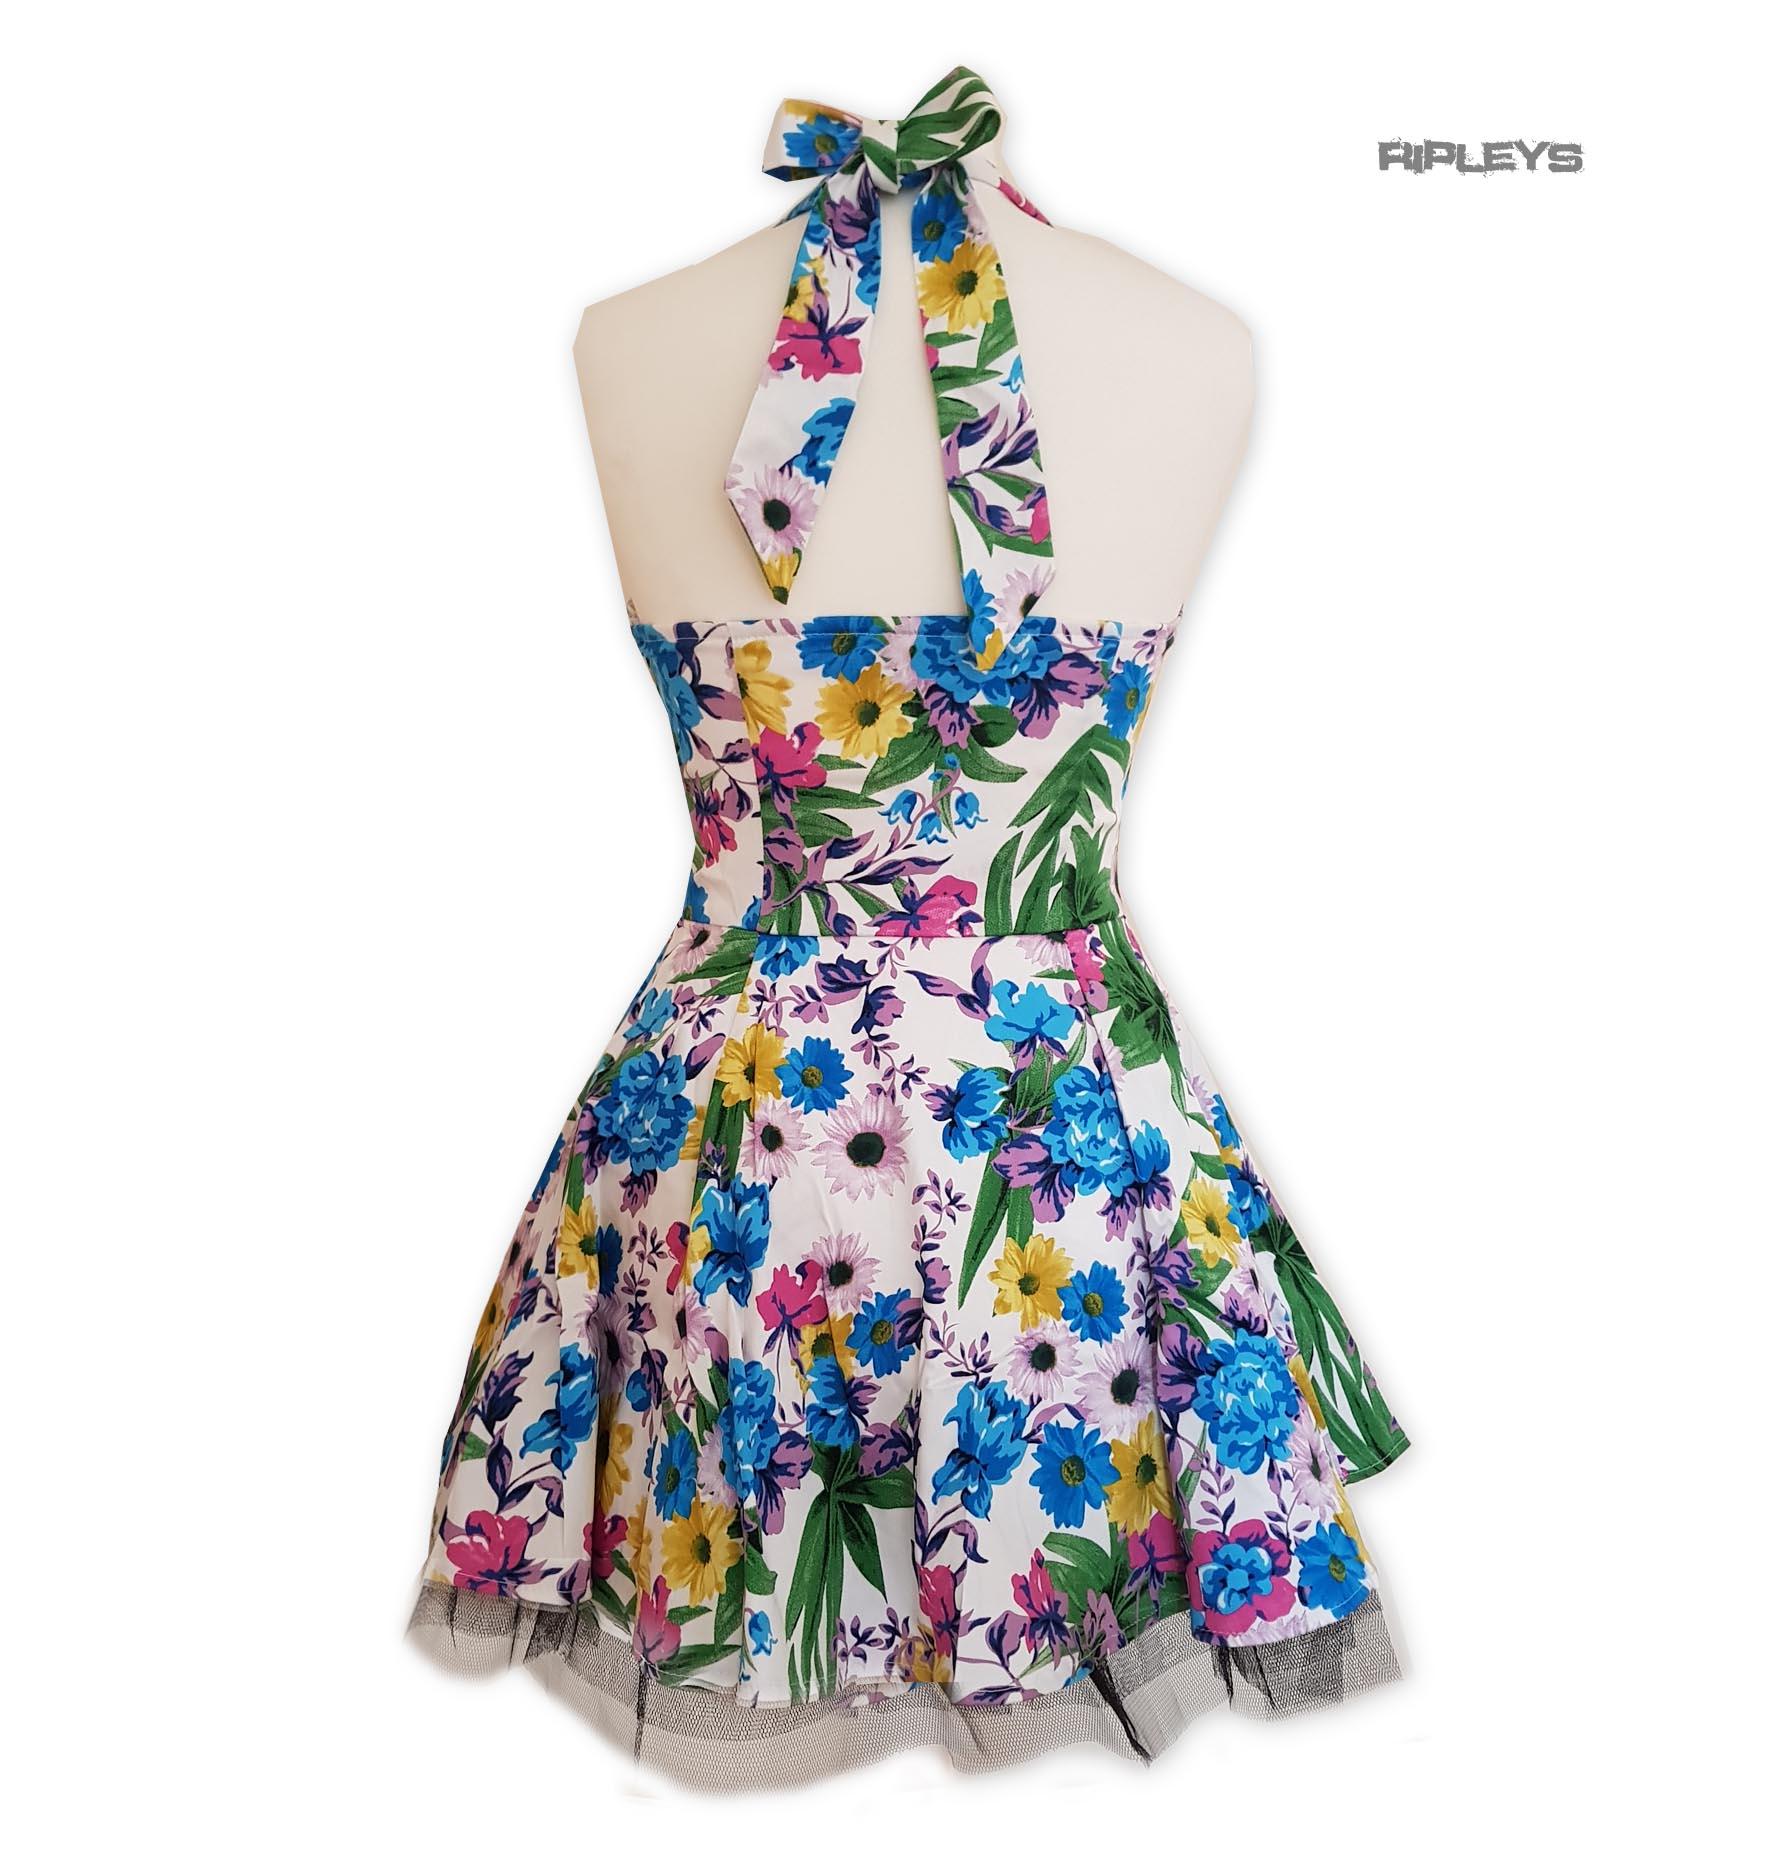 H-amp-R-Hearts-amp-Roses-London-White-Mini-Dress-039-Summer-Day-039-Flowers-All-Sizes thumbnail 12